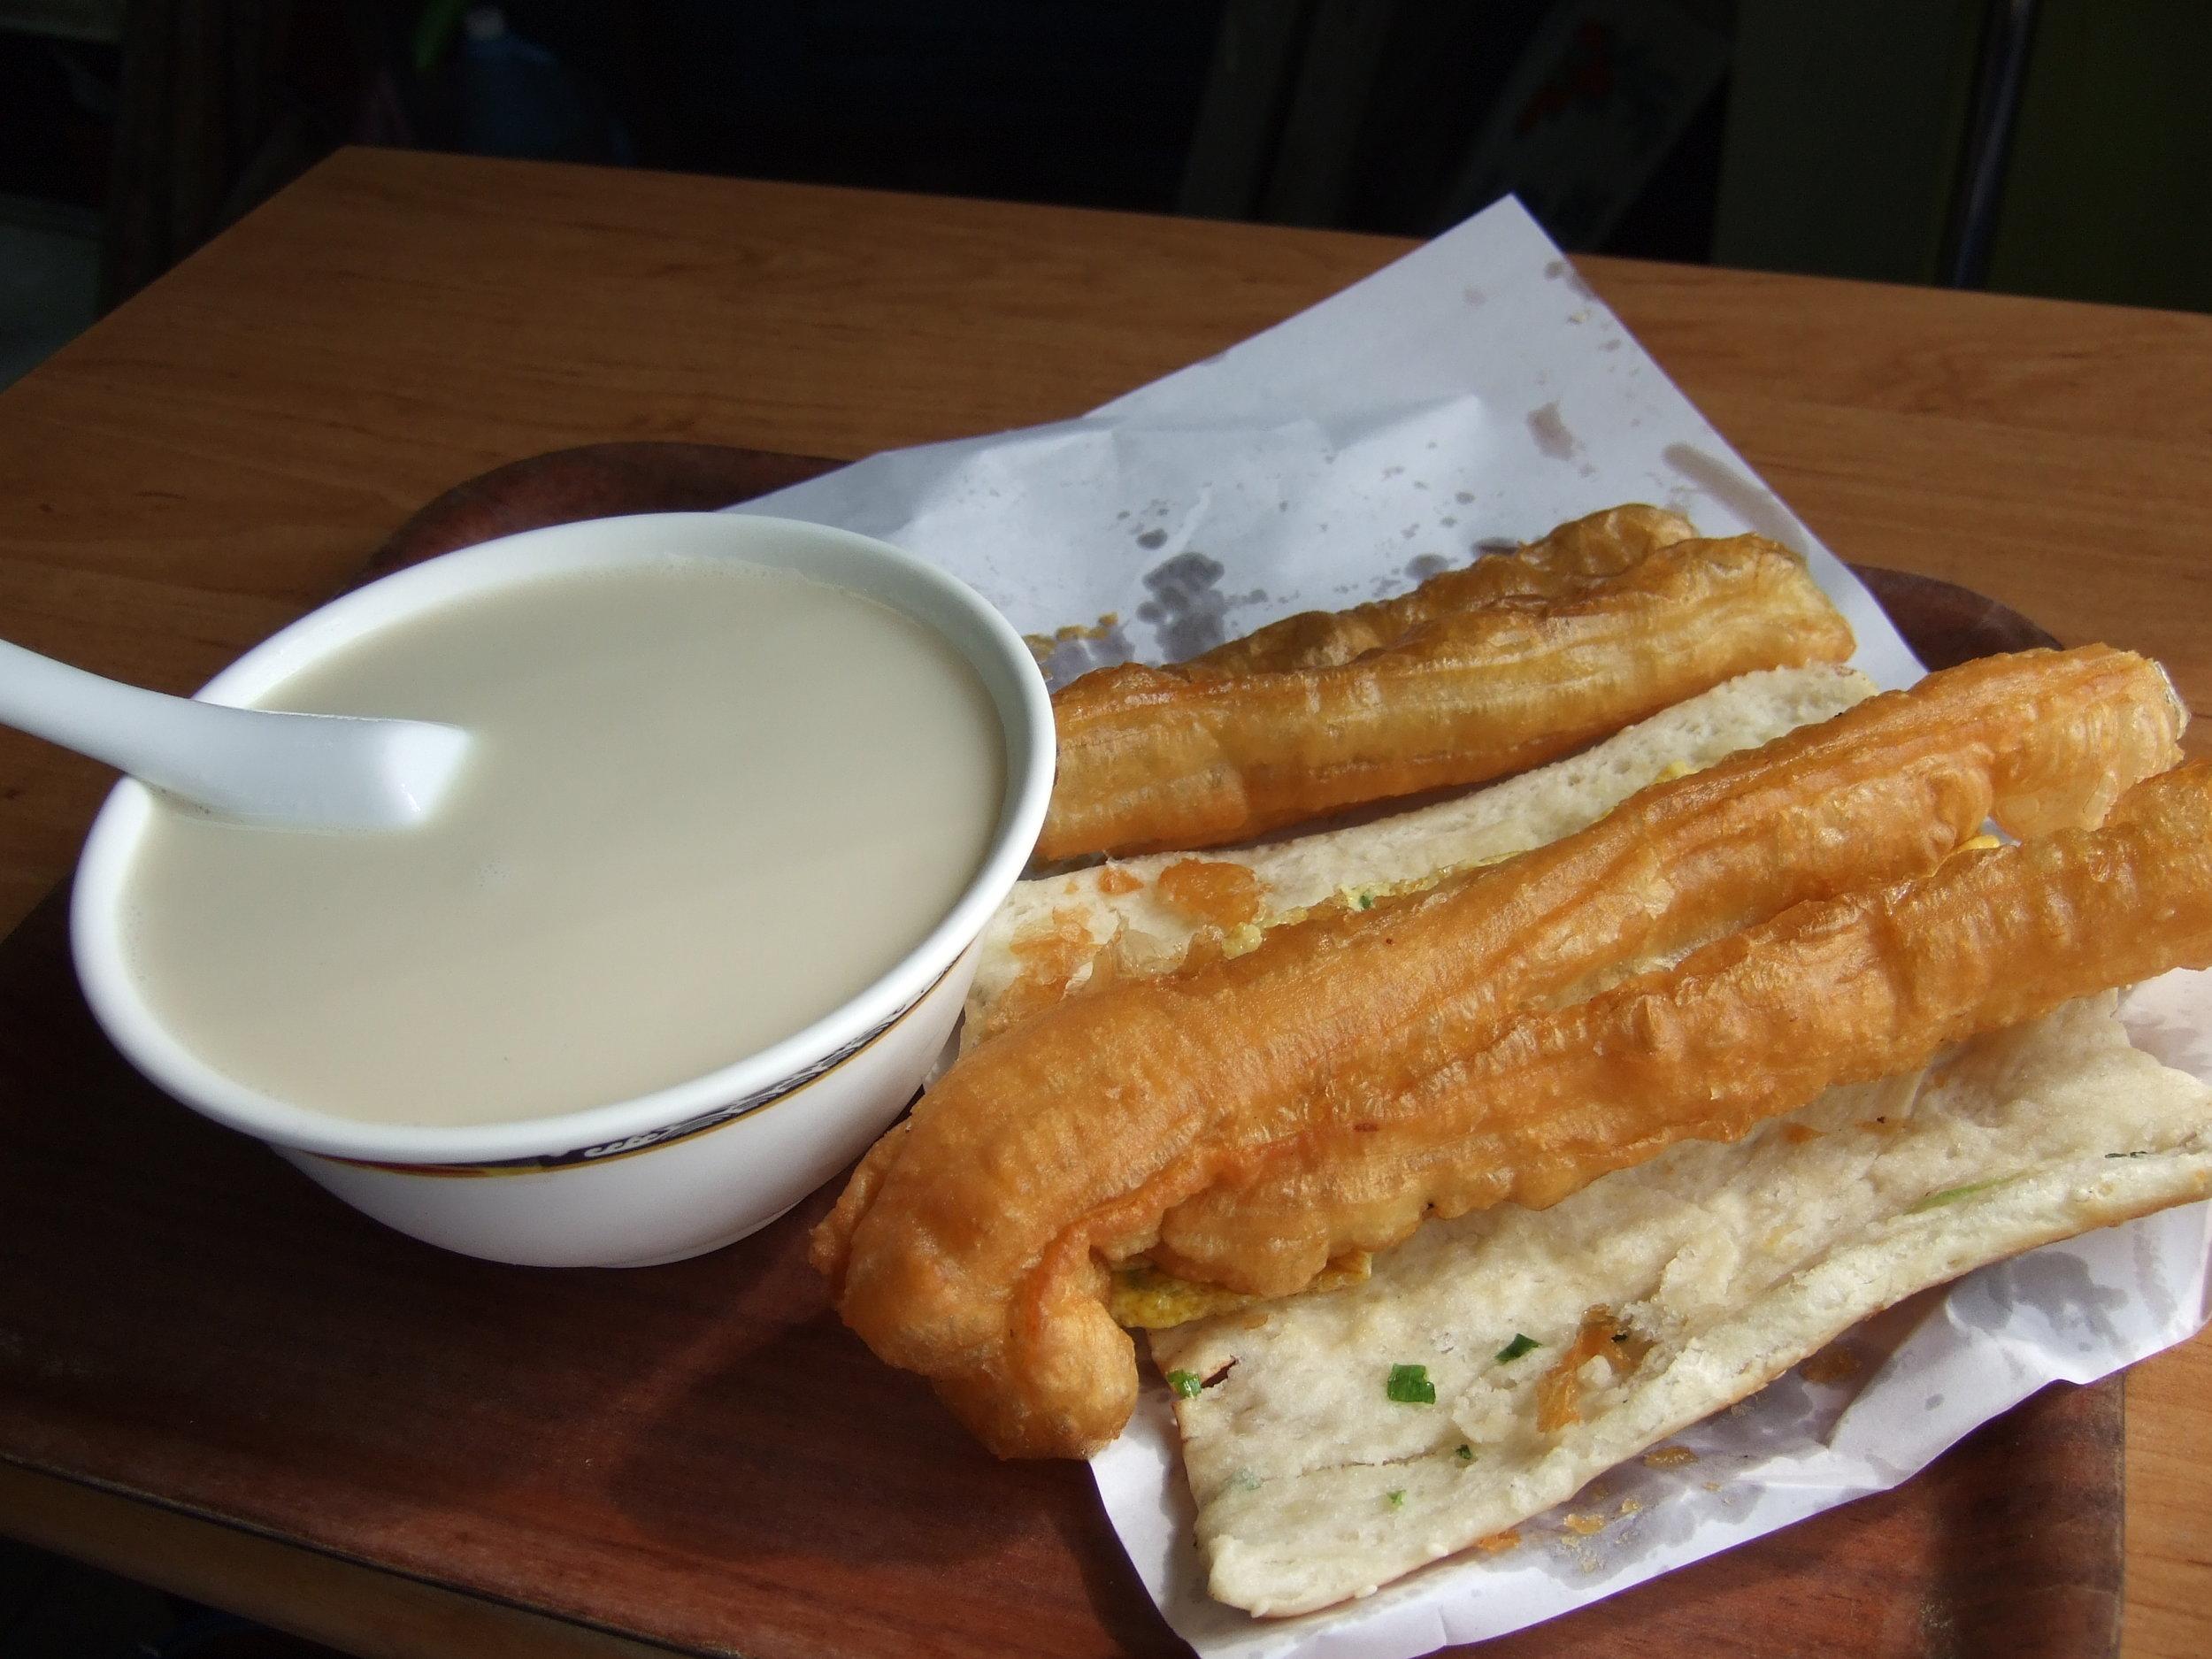 taiwan_breakfast_with_fresh_soymilk_flickr_user_goosmurf.jpg